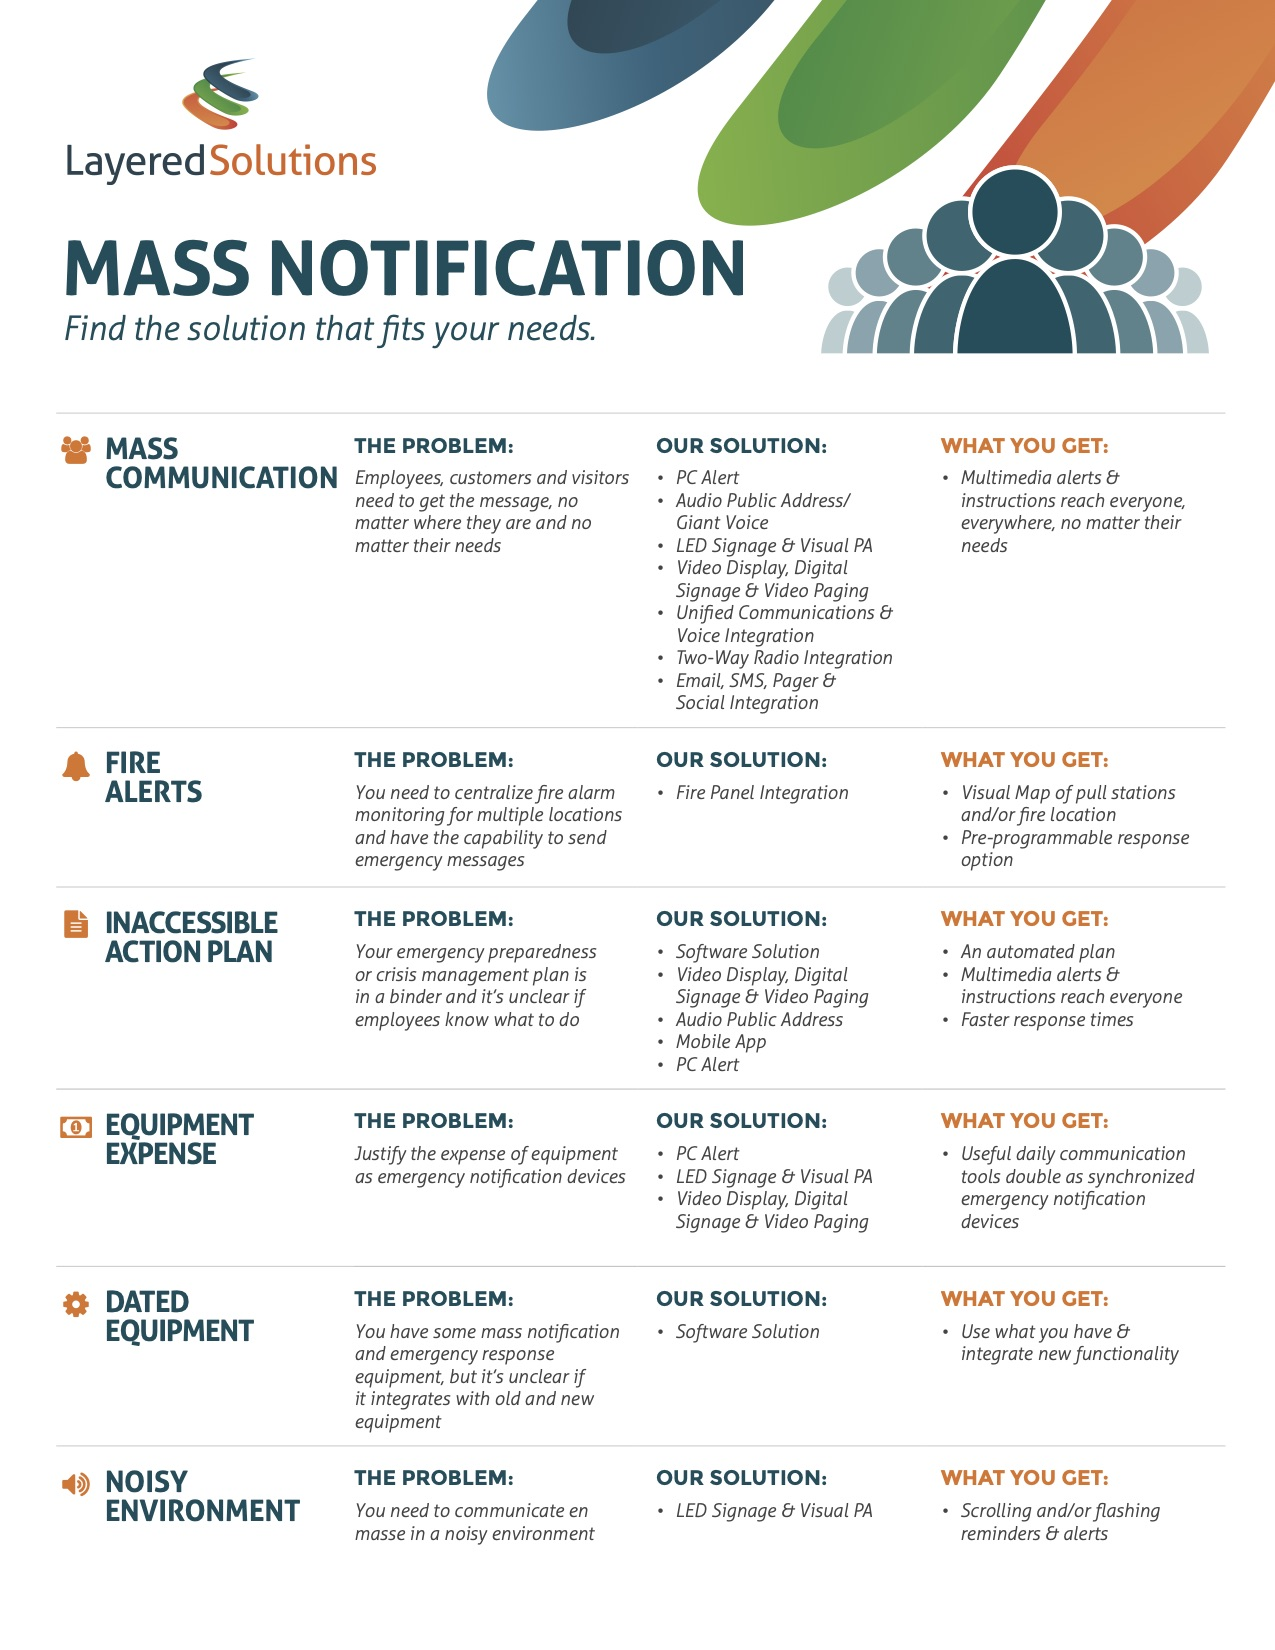 LSI_IfThenChart_MassNotification_F